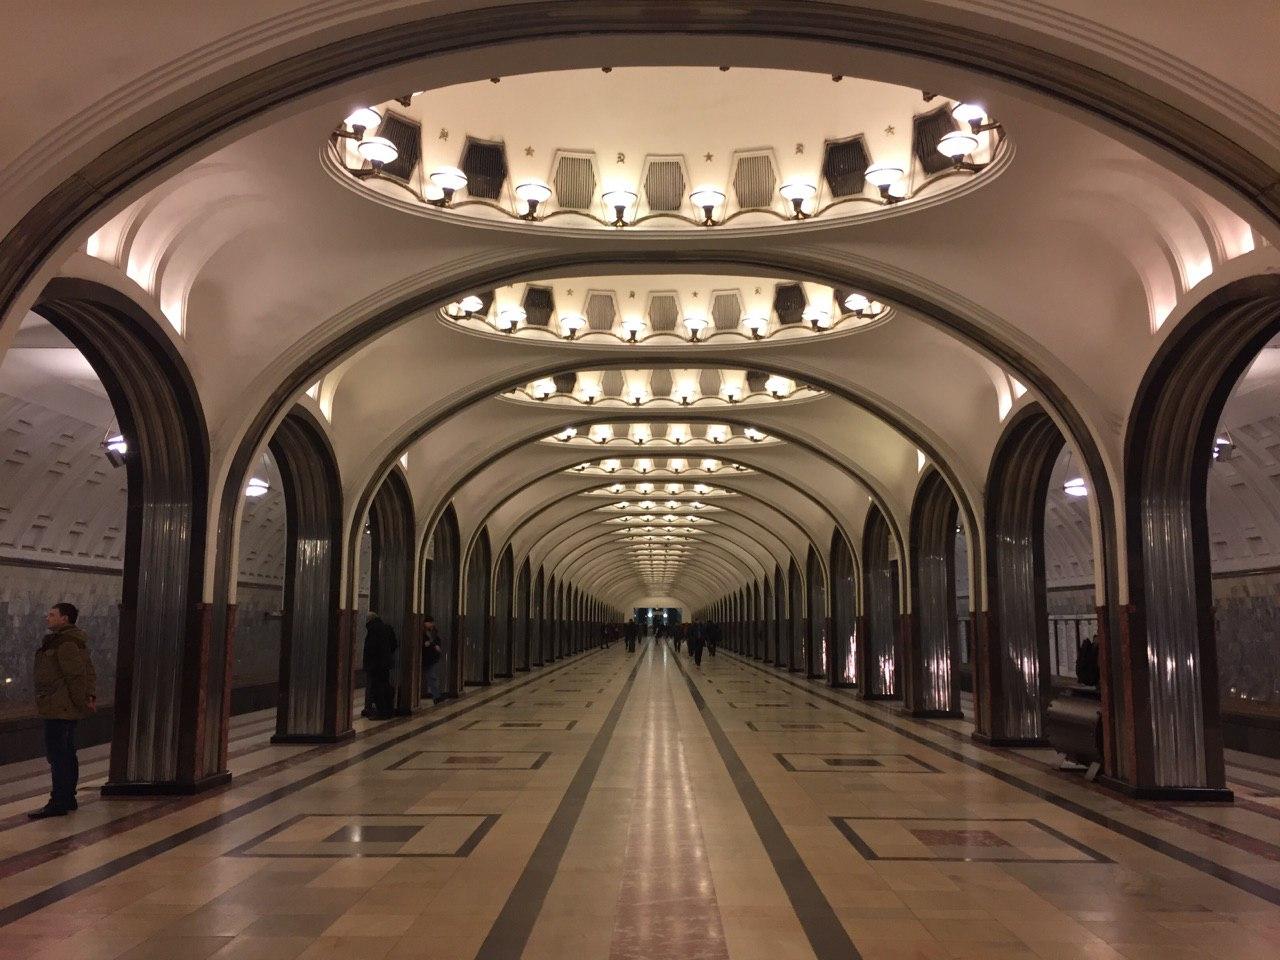 THIX3-onAb8 Москва - столица России.